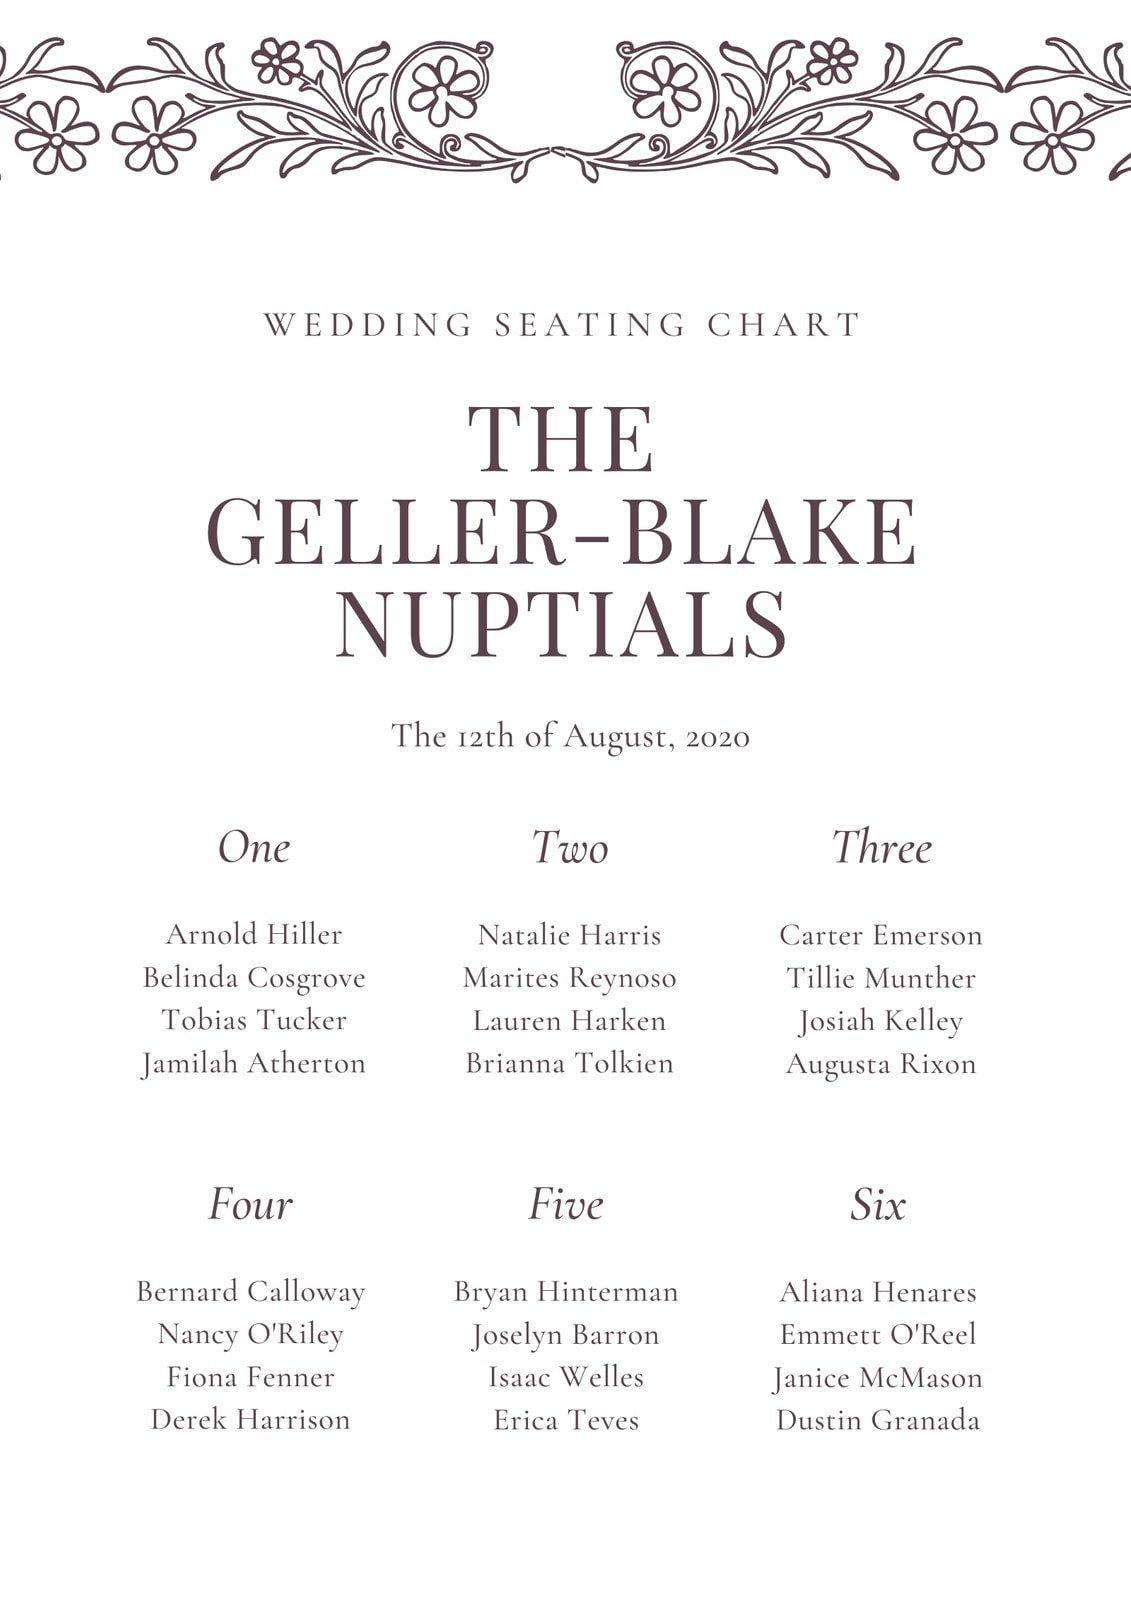 White and Black Bordered Vintage Illustration Wedding Seating Chart